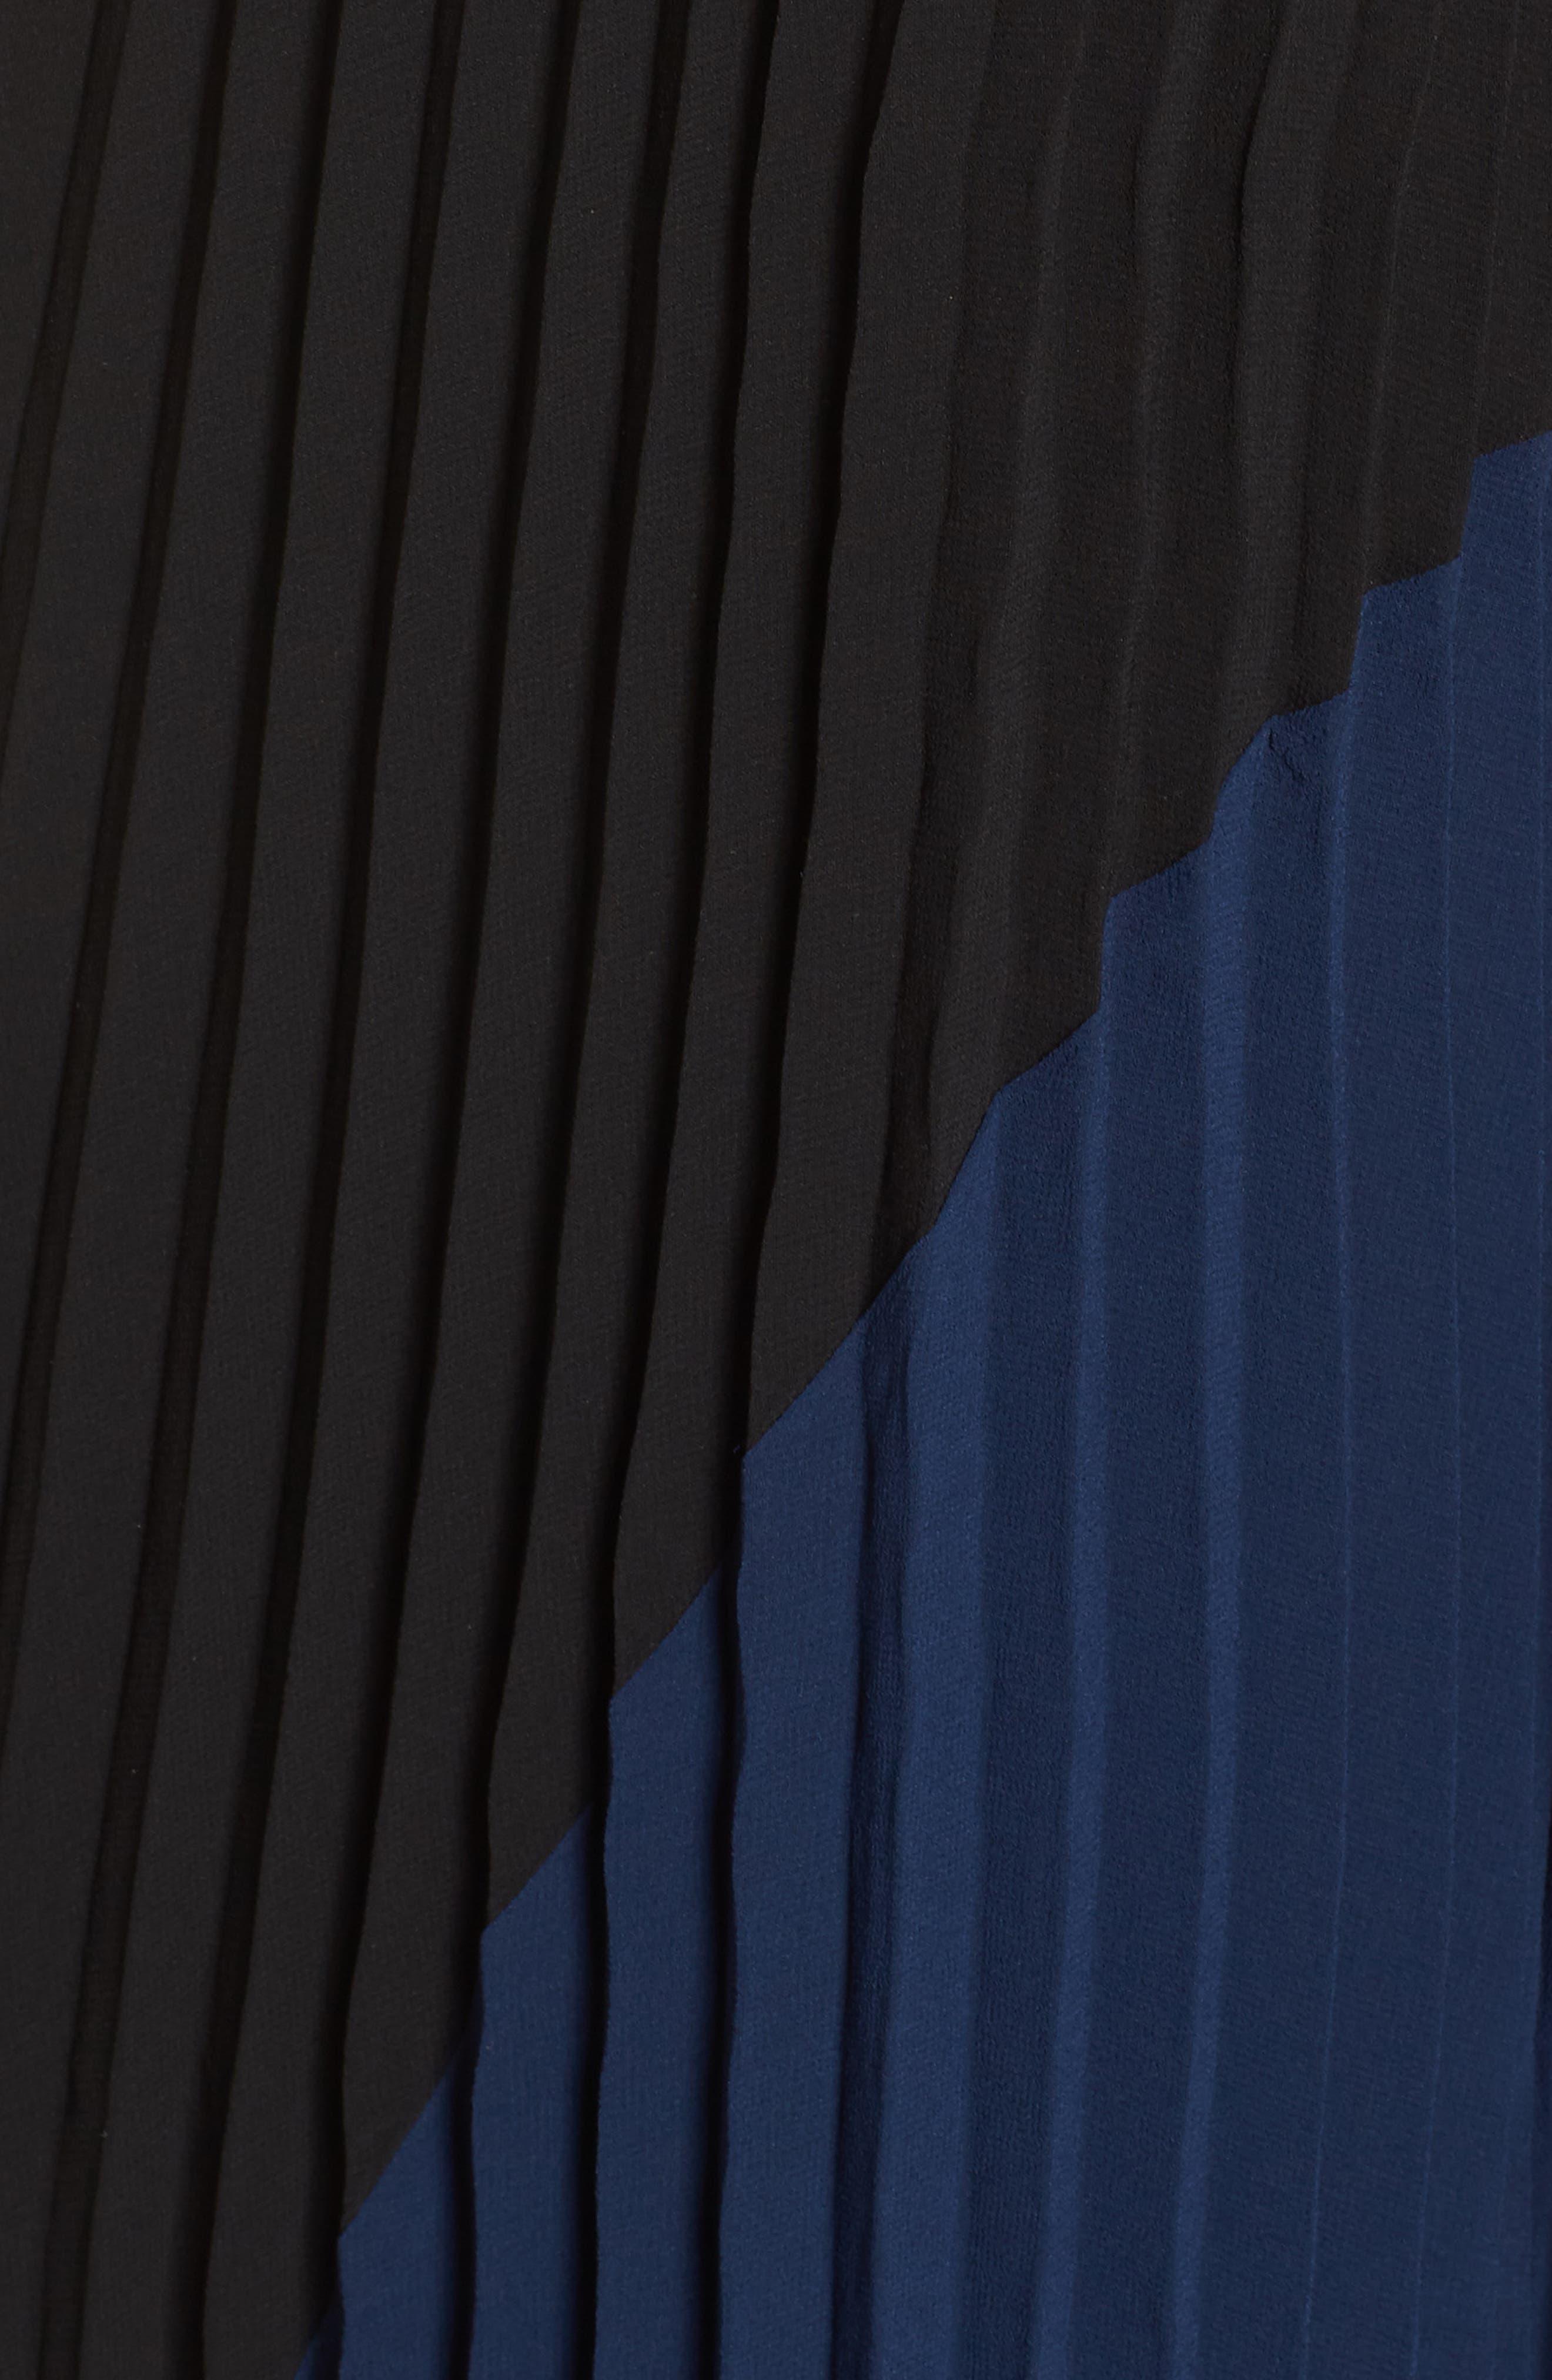 Nealea Pleat Chiffon Gown,                             Alternate thumbnail 6, color,                             006